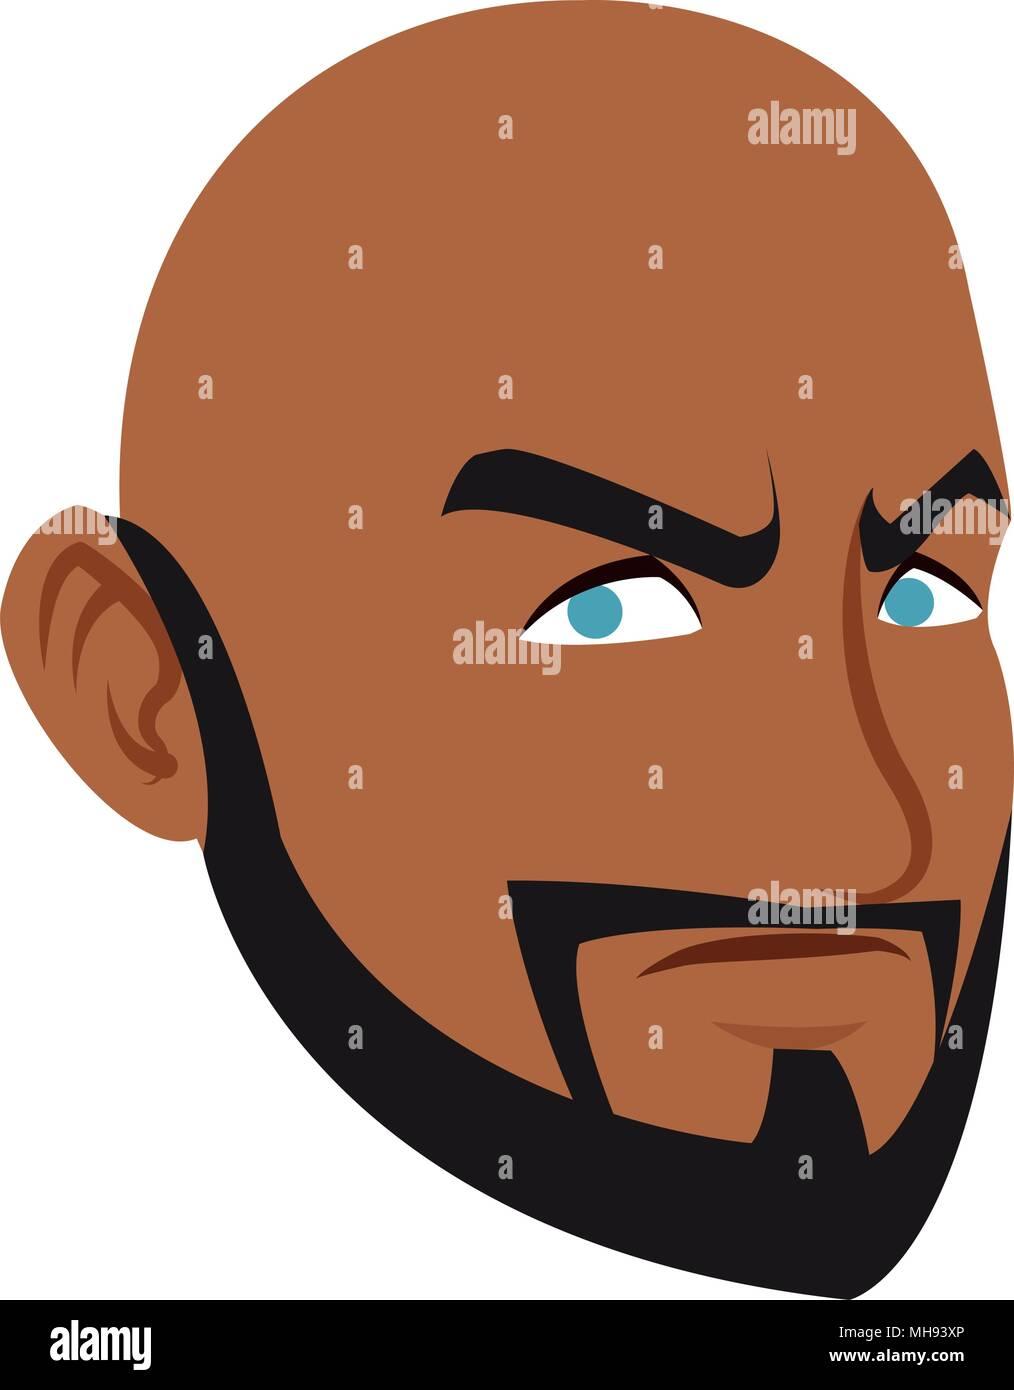 angry man face cartoon